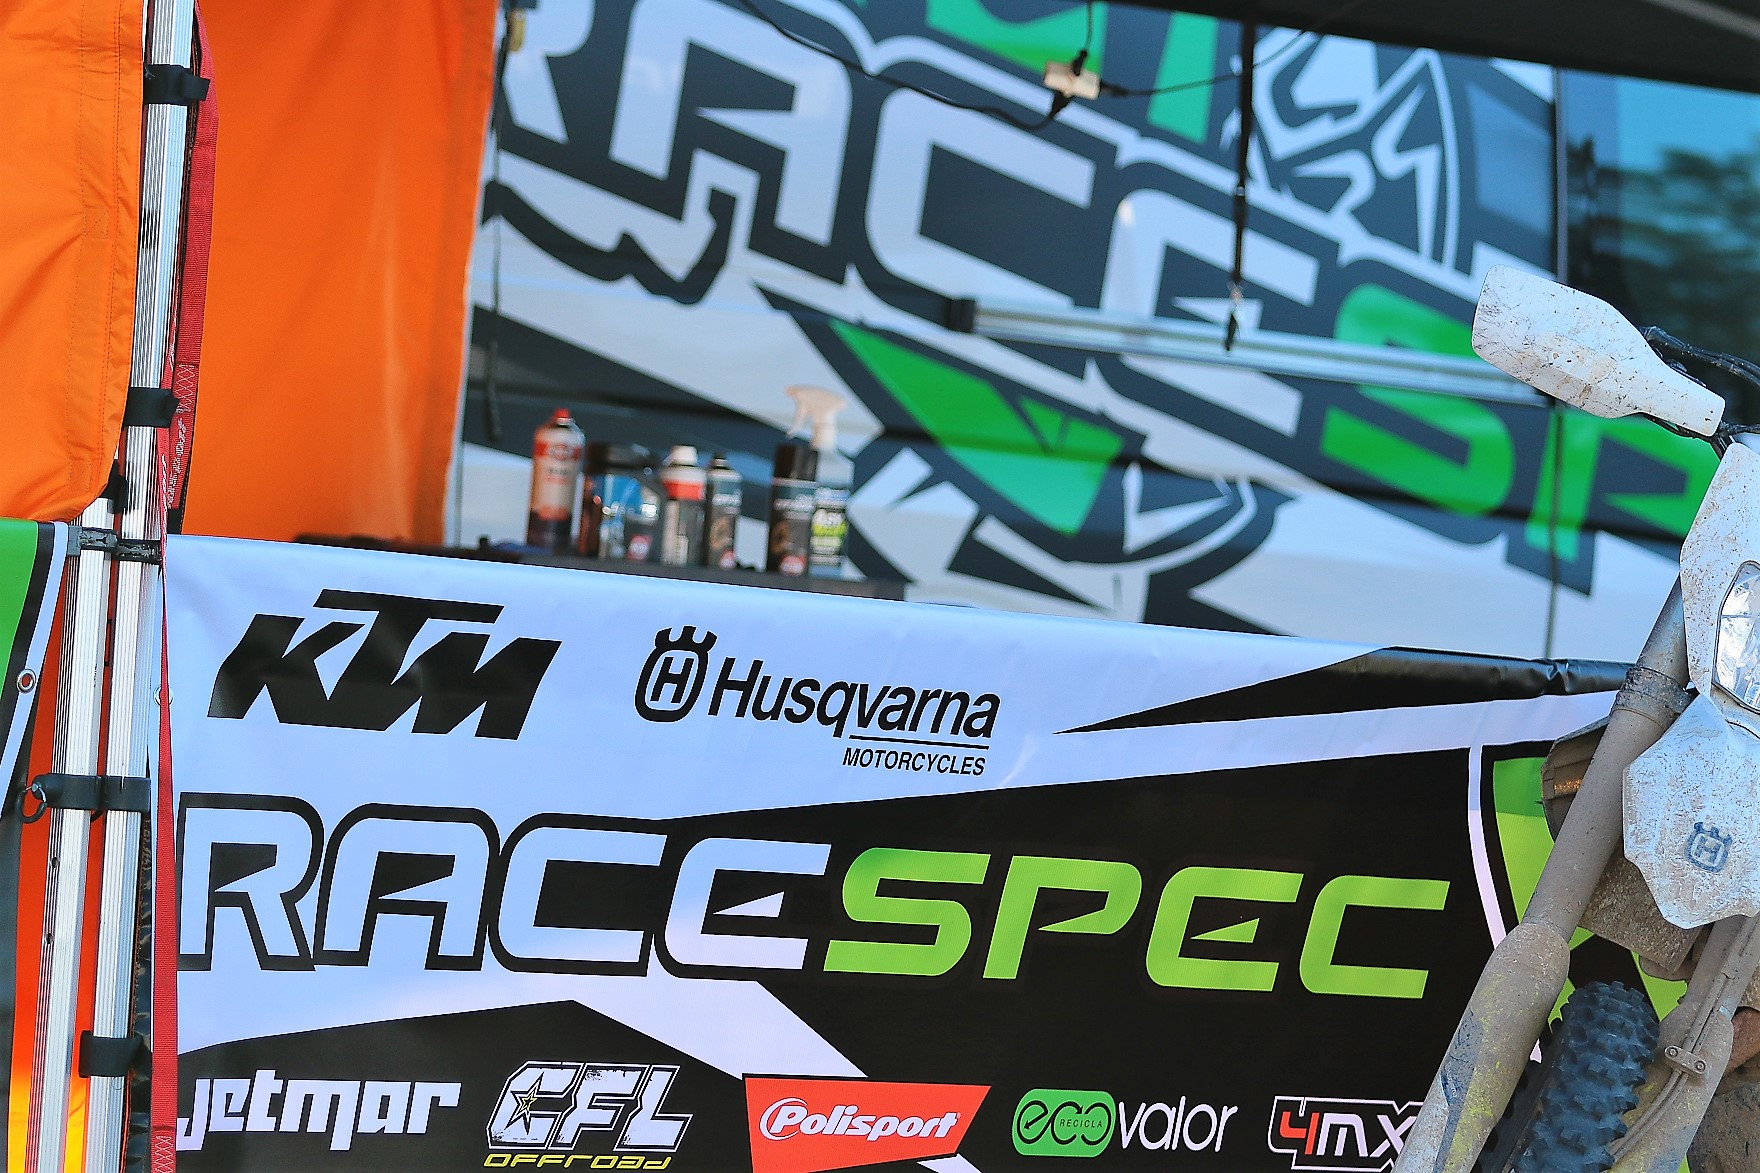 Team Racespec|CFL Offroad preparada para a nova temporada